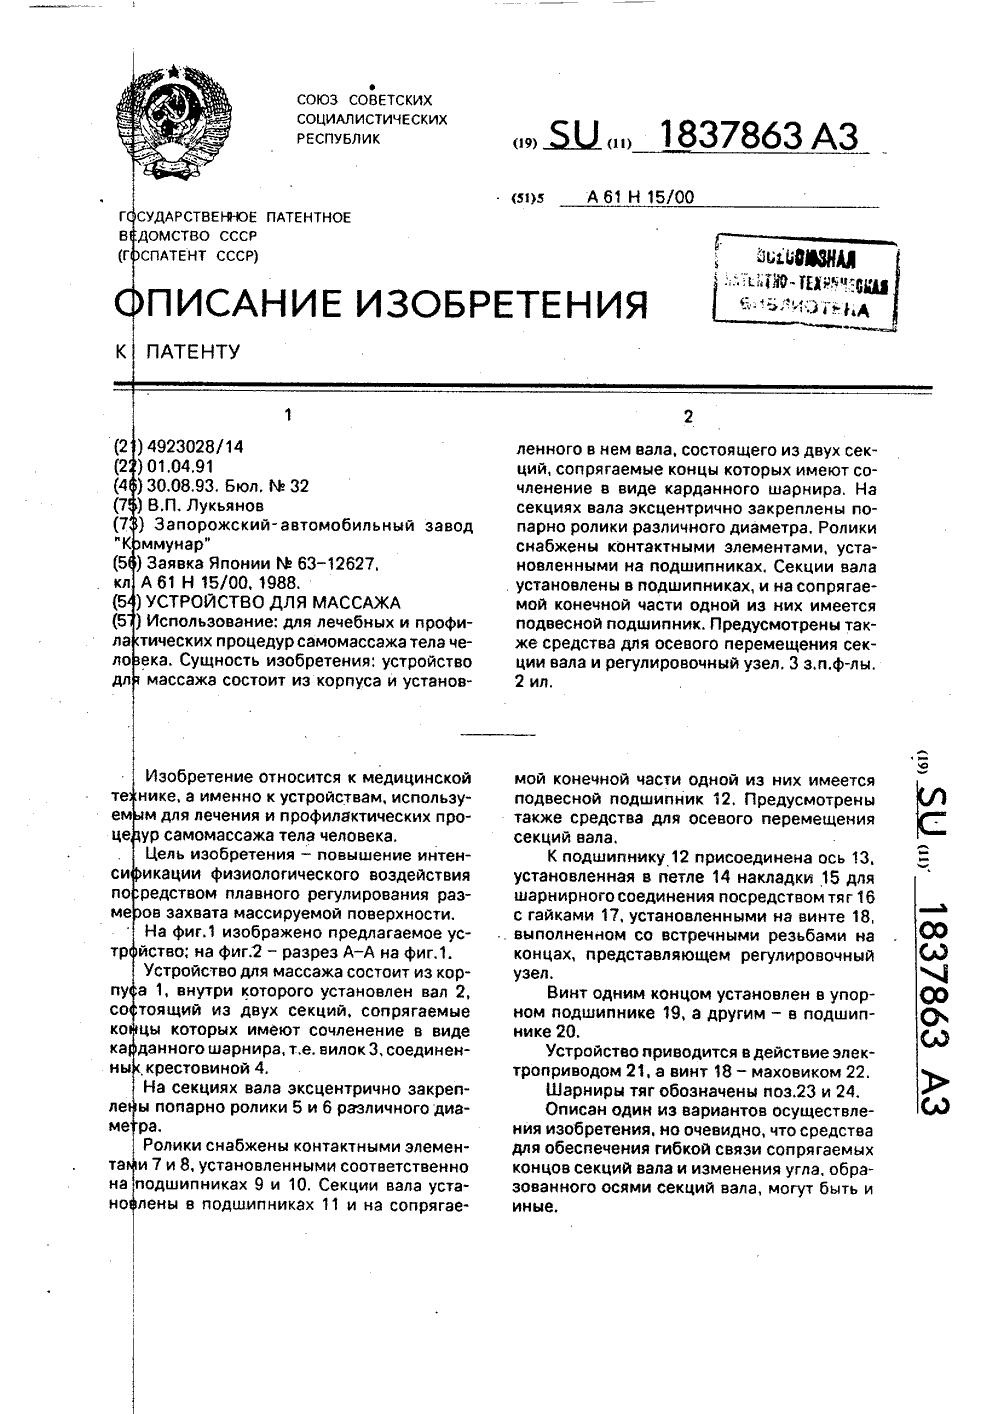 Киноангиокардиография